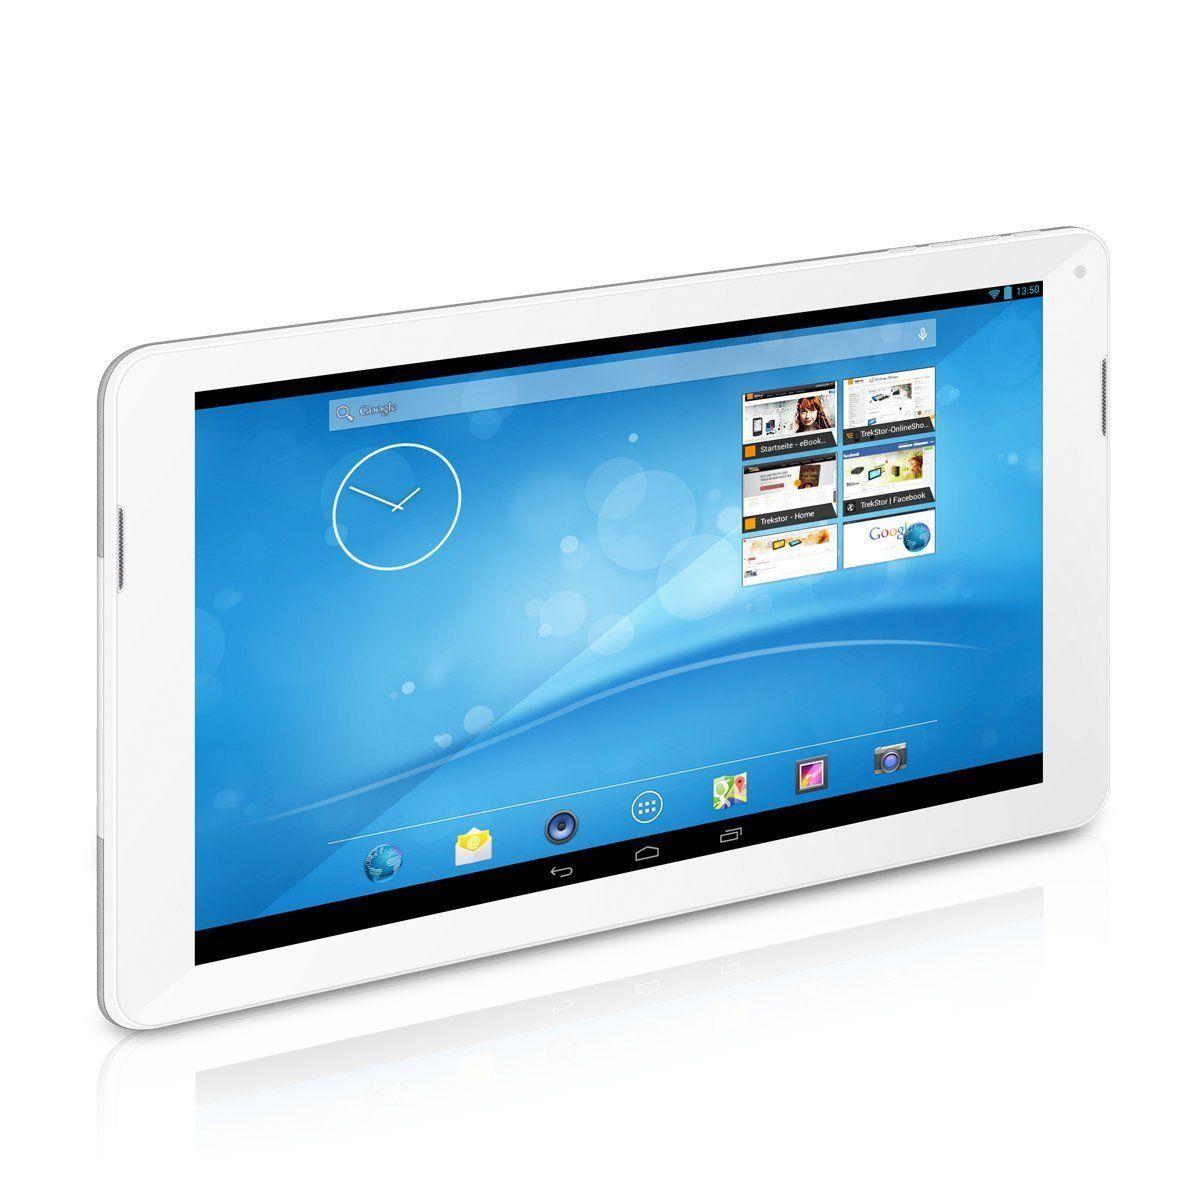 Trekstor 10.1 Zoll (25,7cm) SurfTab breeze Tablet 1GB 8GB 4x1,3 GHz Android 4.4